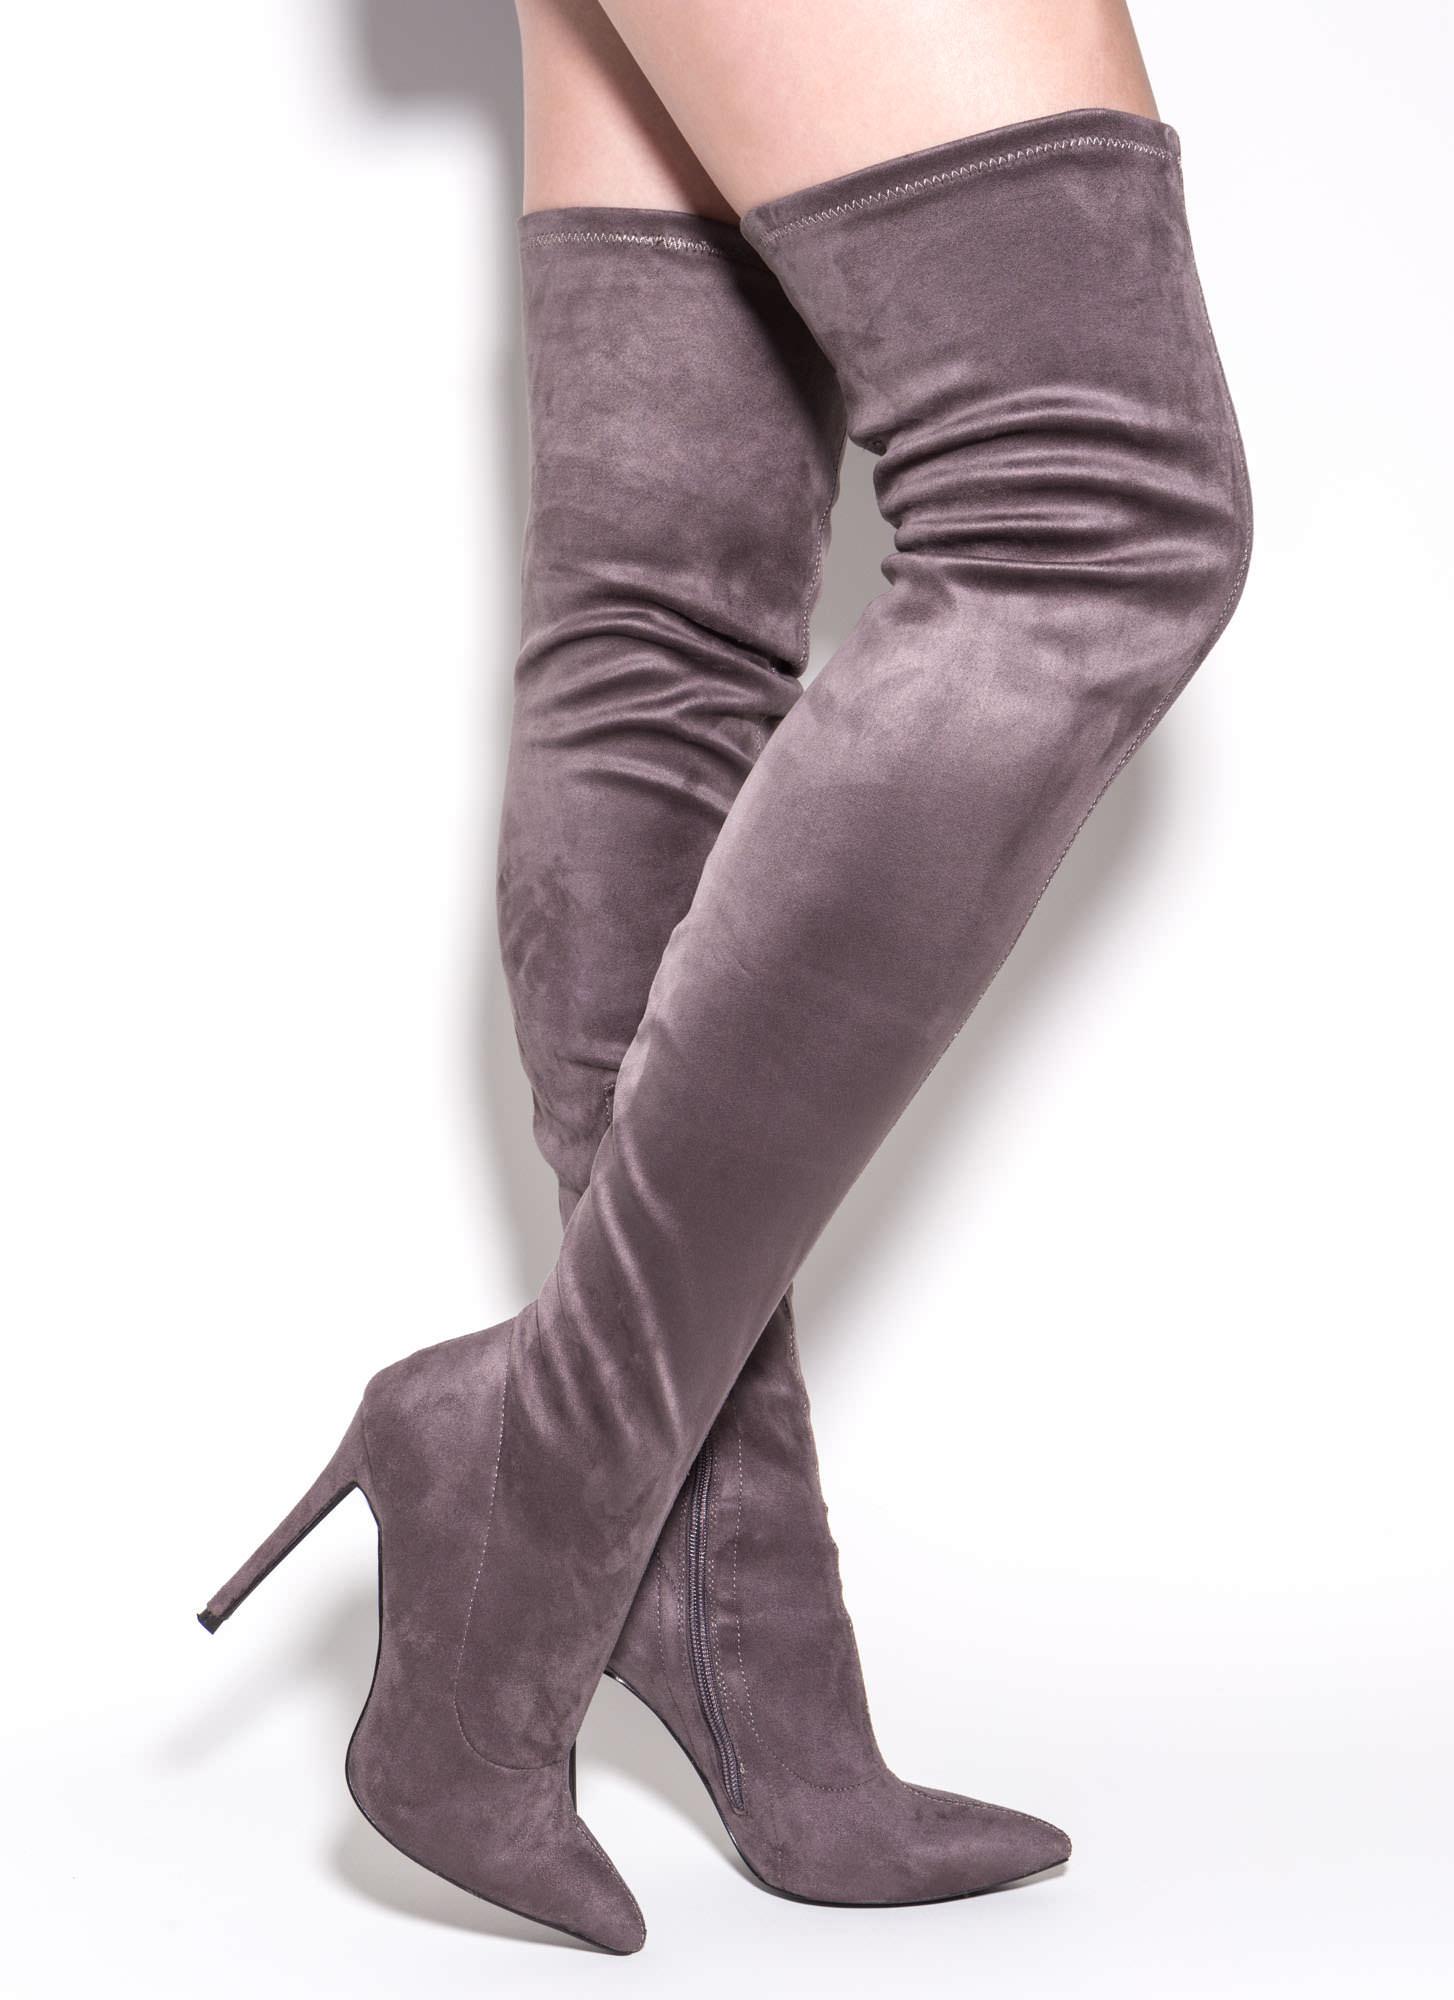 Story Chic Thigh-High Boots BLACK GREY MAROON - GoJane.com